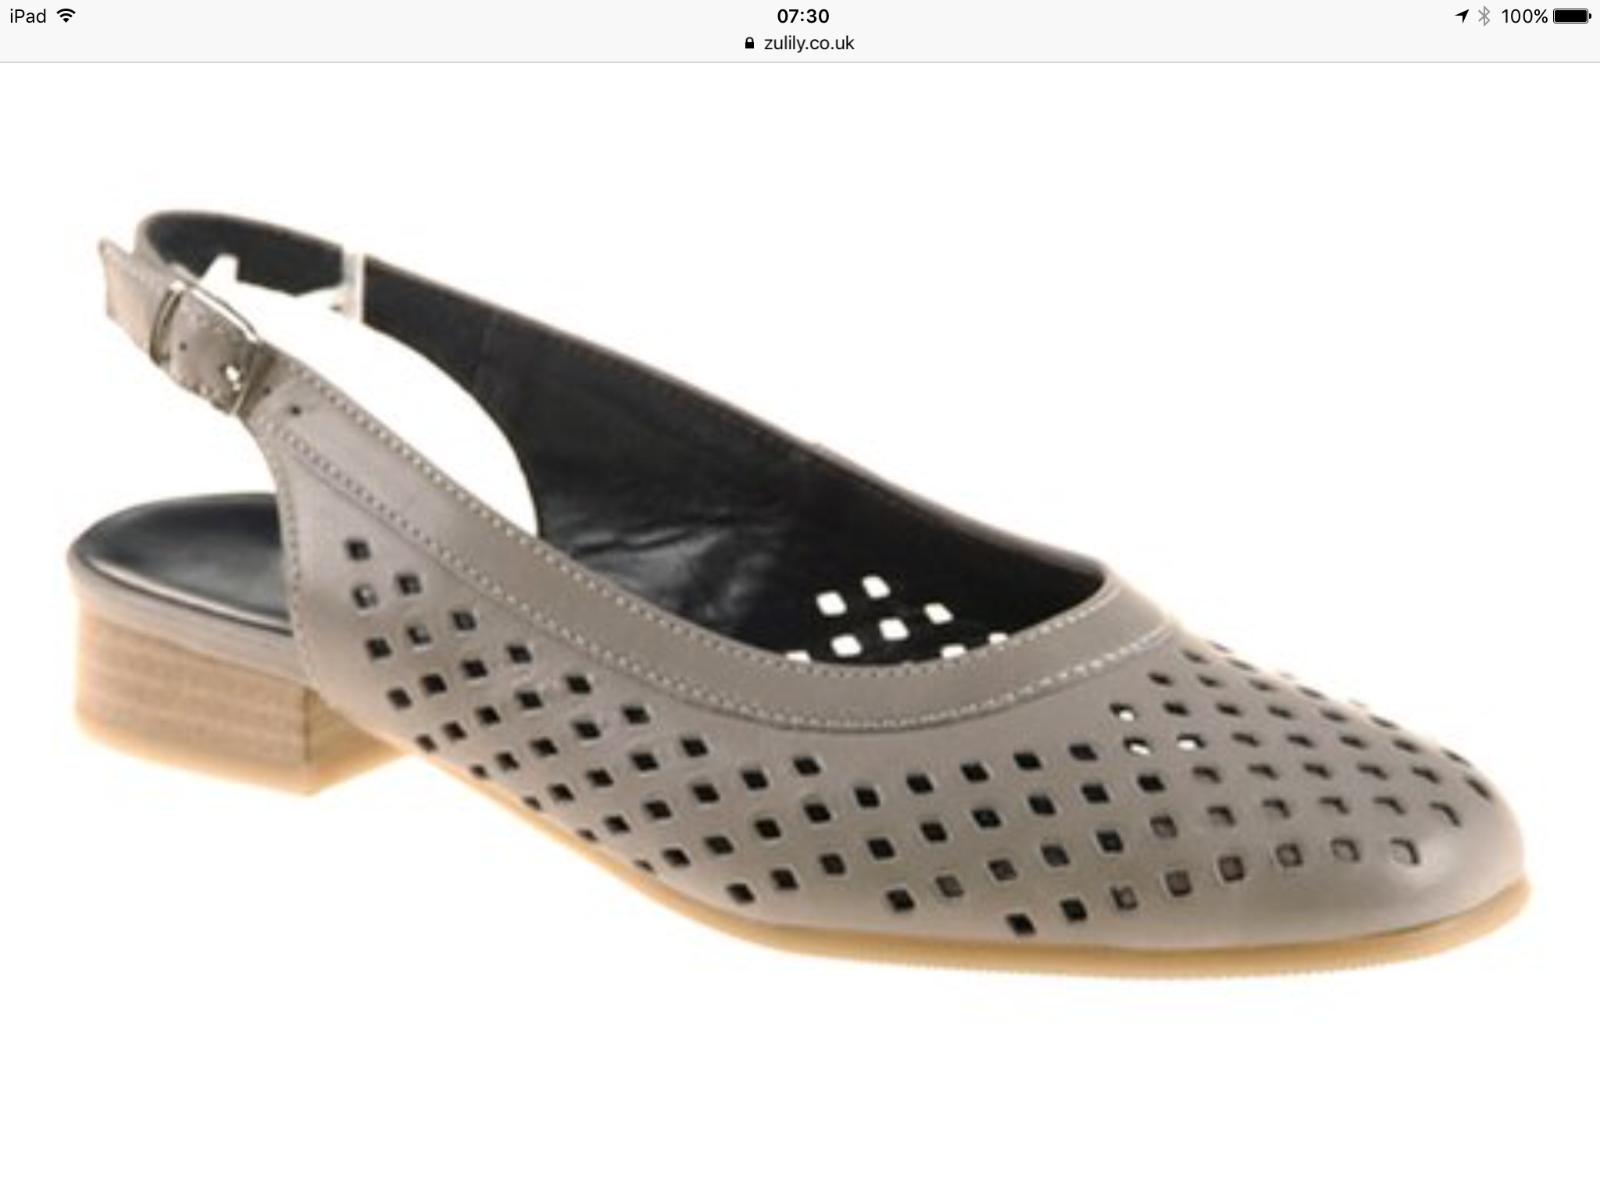 Lot 33 - Ara Grey Bindi Leather Slingback Sandal, Size Us 7 Uk 4.5 (New With Box) [Ref: 36526835- C-002]